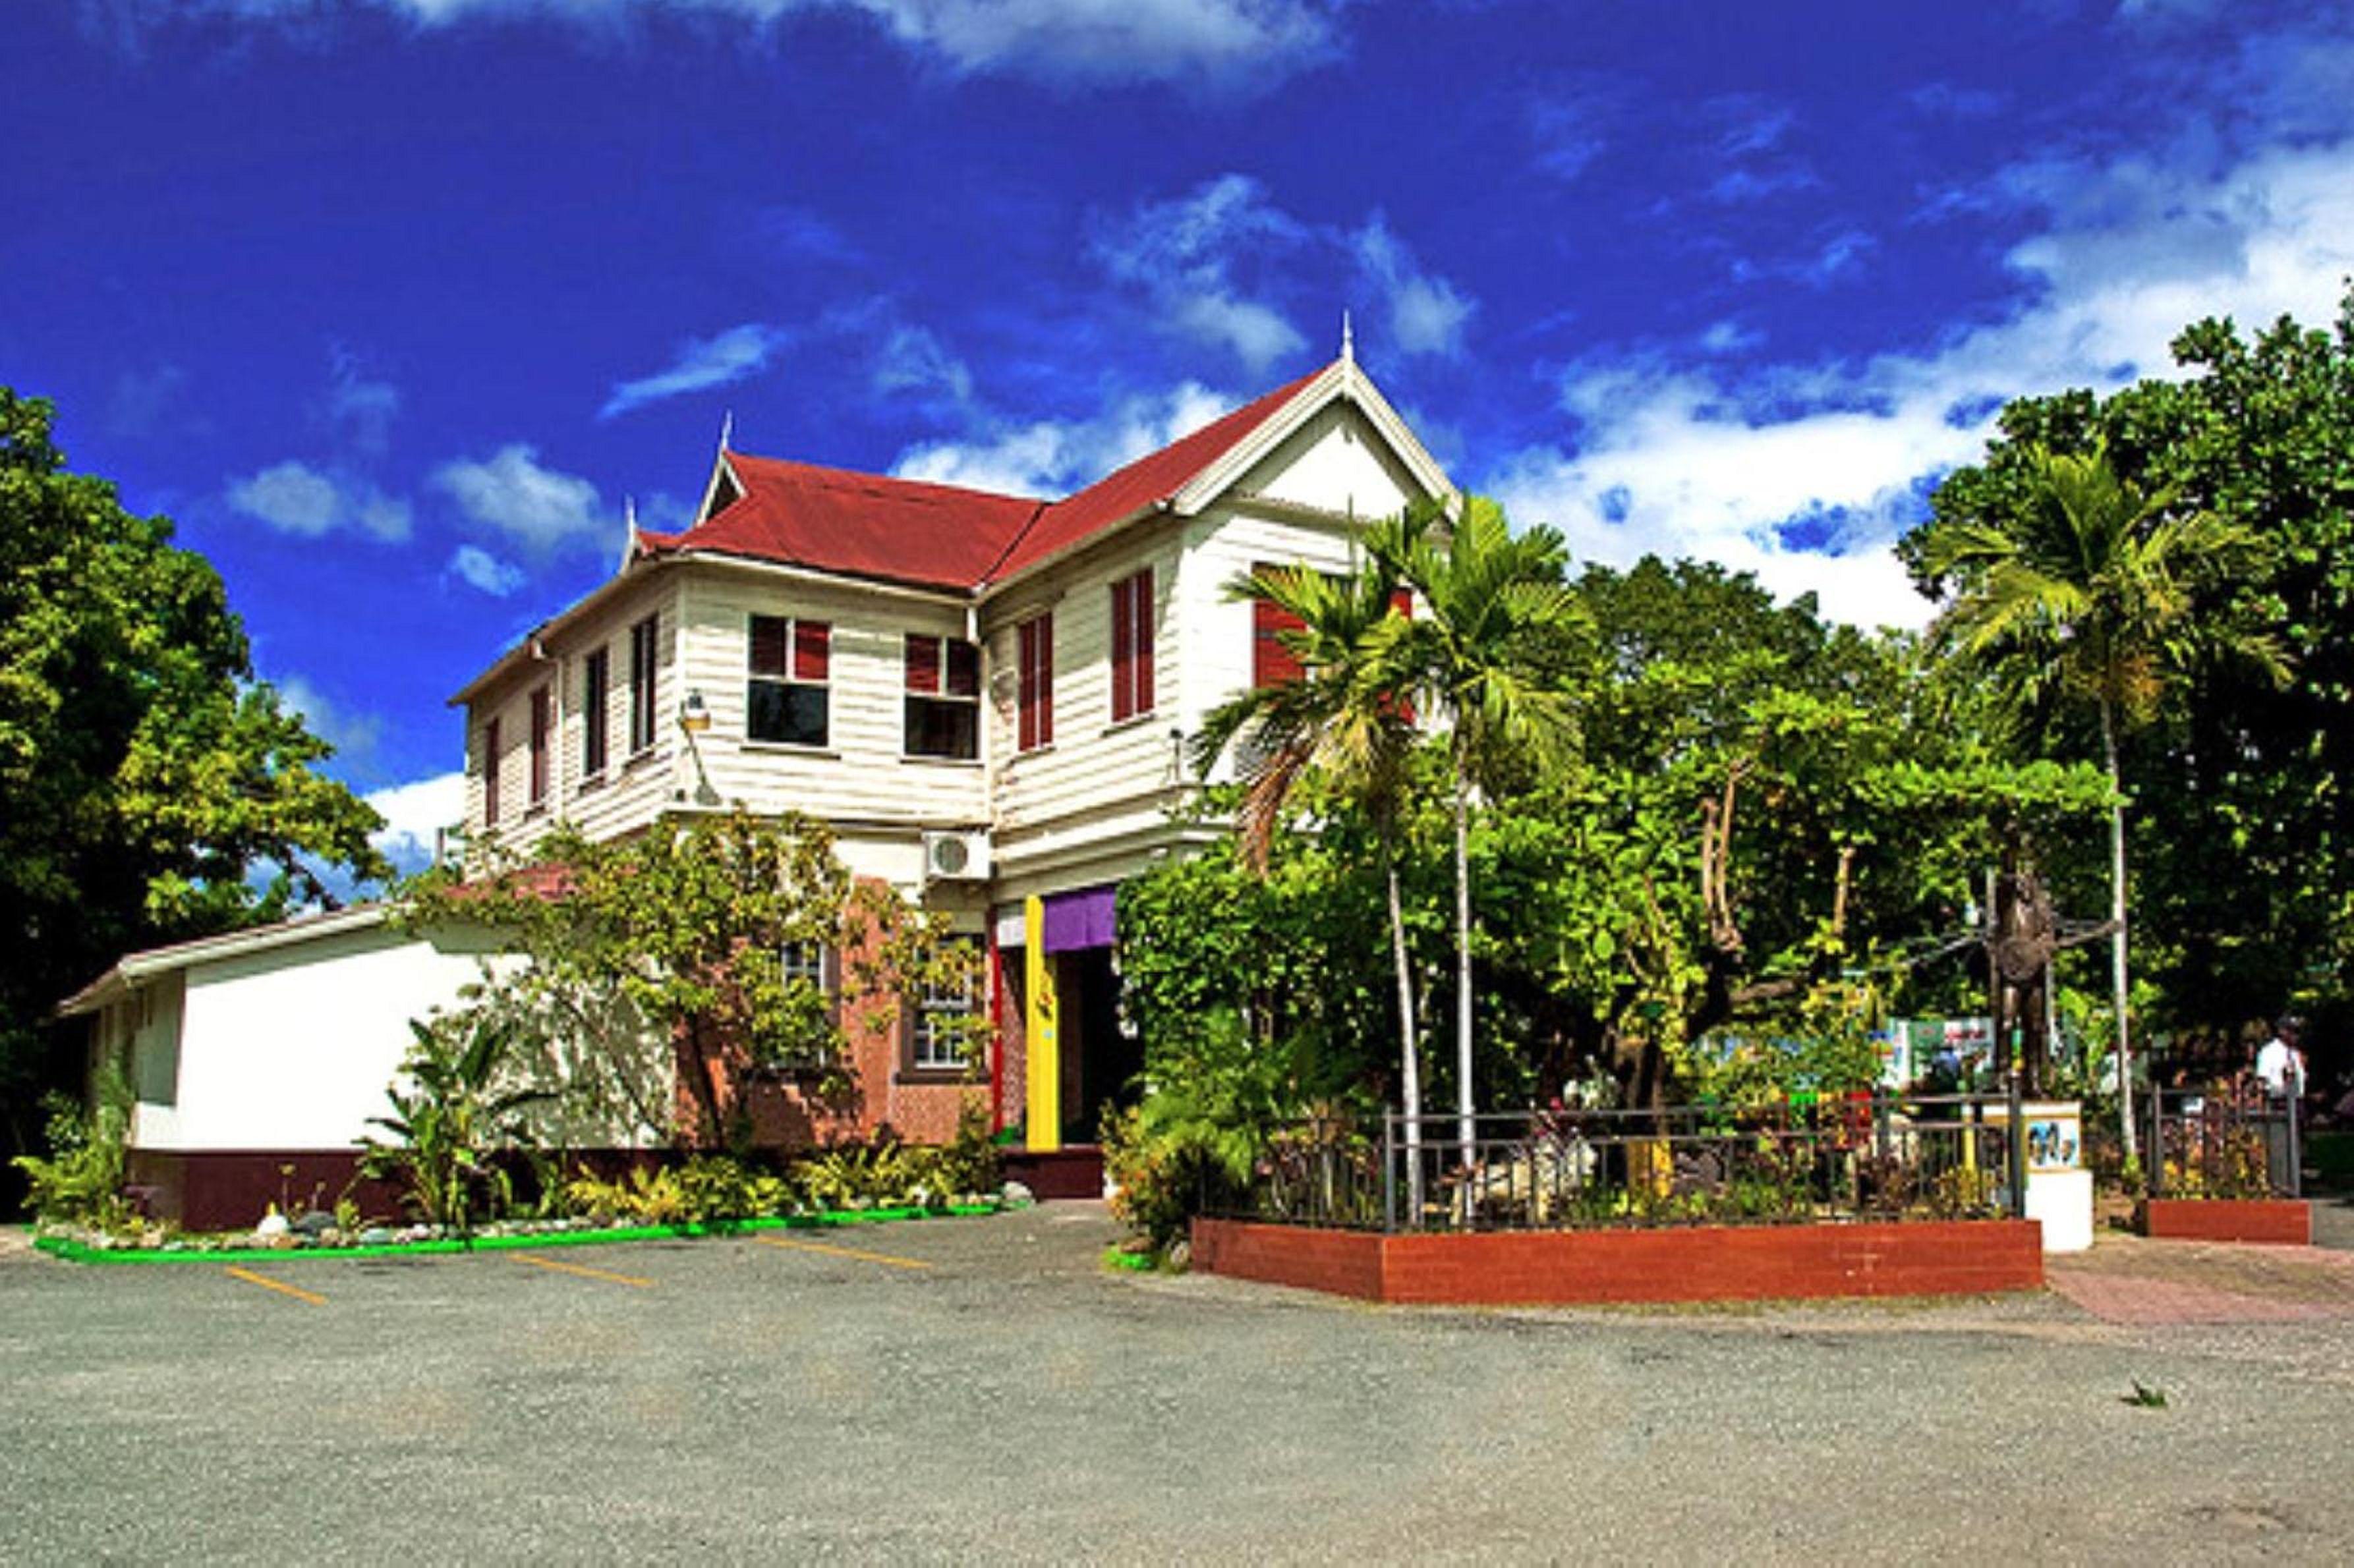 52c5a128195de4a57c6d62c8bc68d5be - House For Rent In Washington Gardens Kingston Jamaica 2017